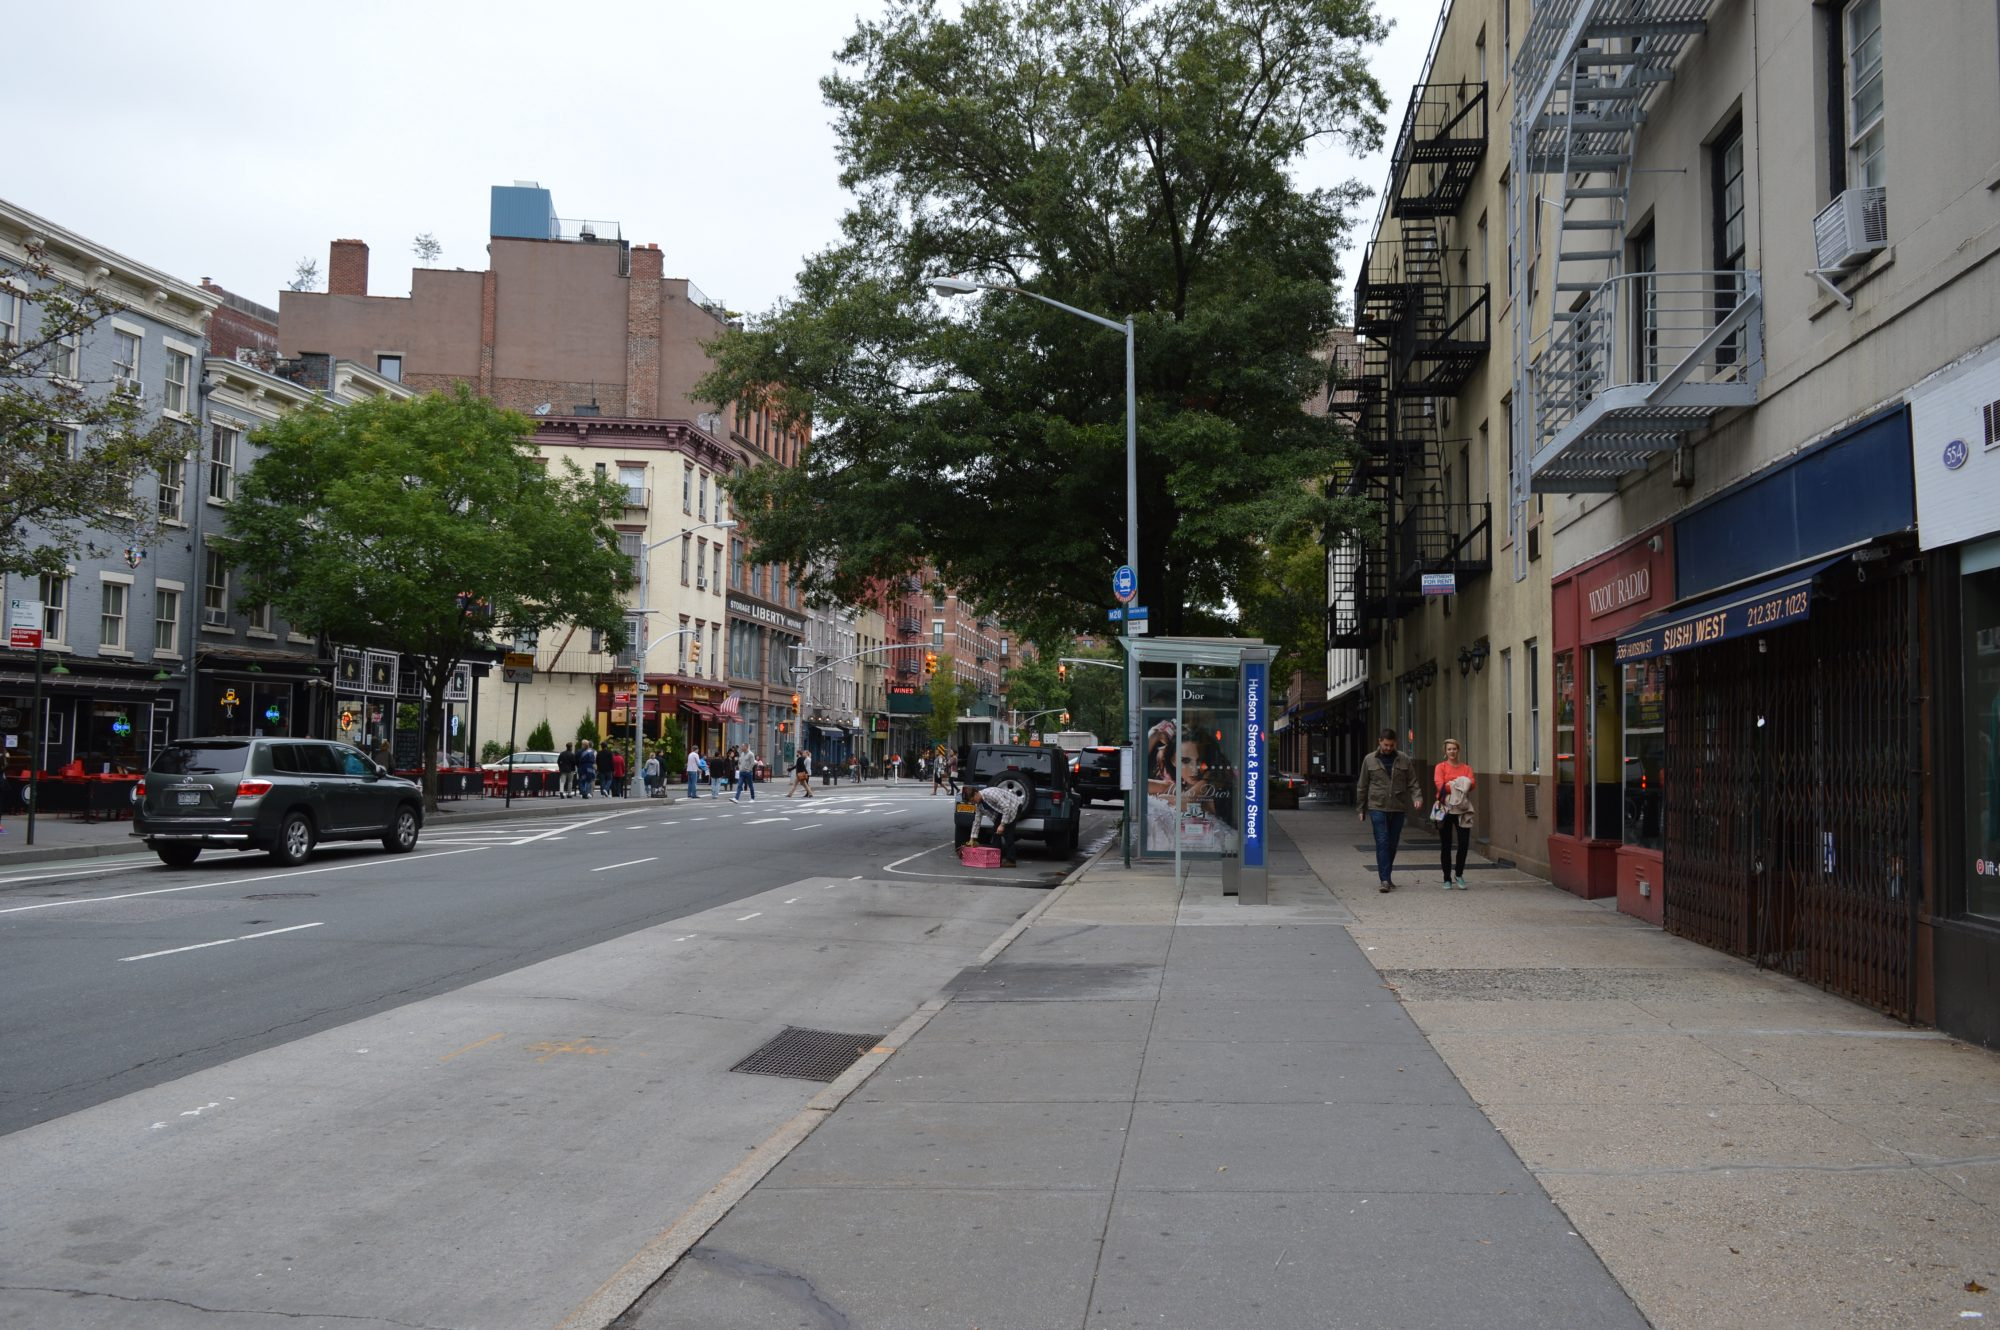 West Village, New York City